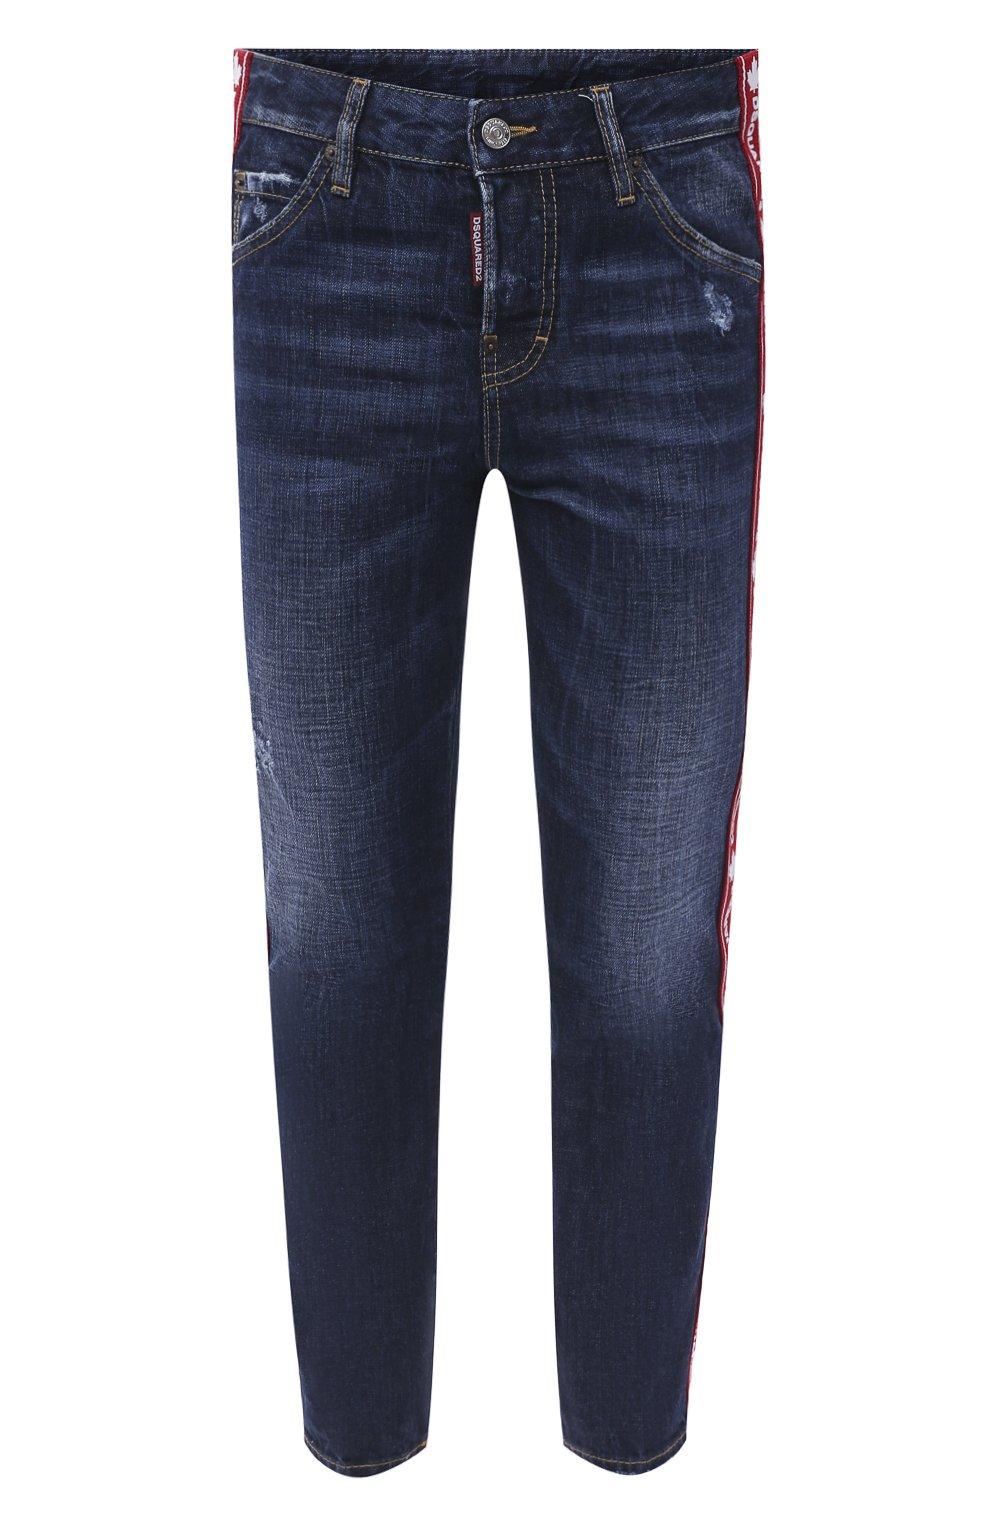 Женские джинсы DSQUARED2 синего цвета, арт. S75LB0411/S30309   Фото 1